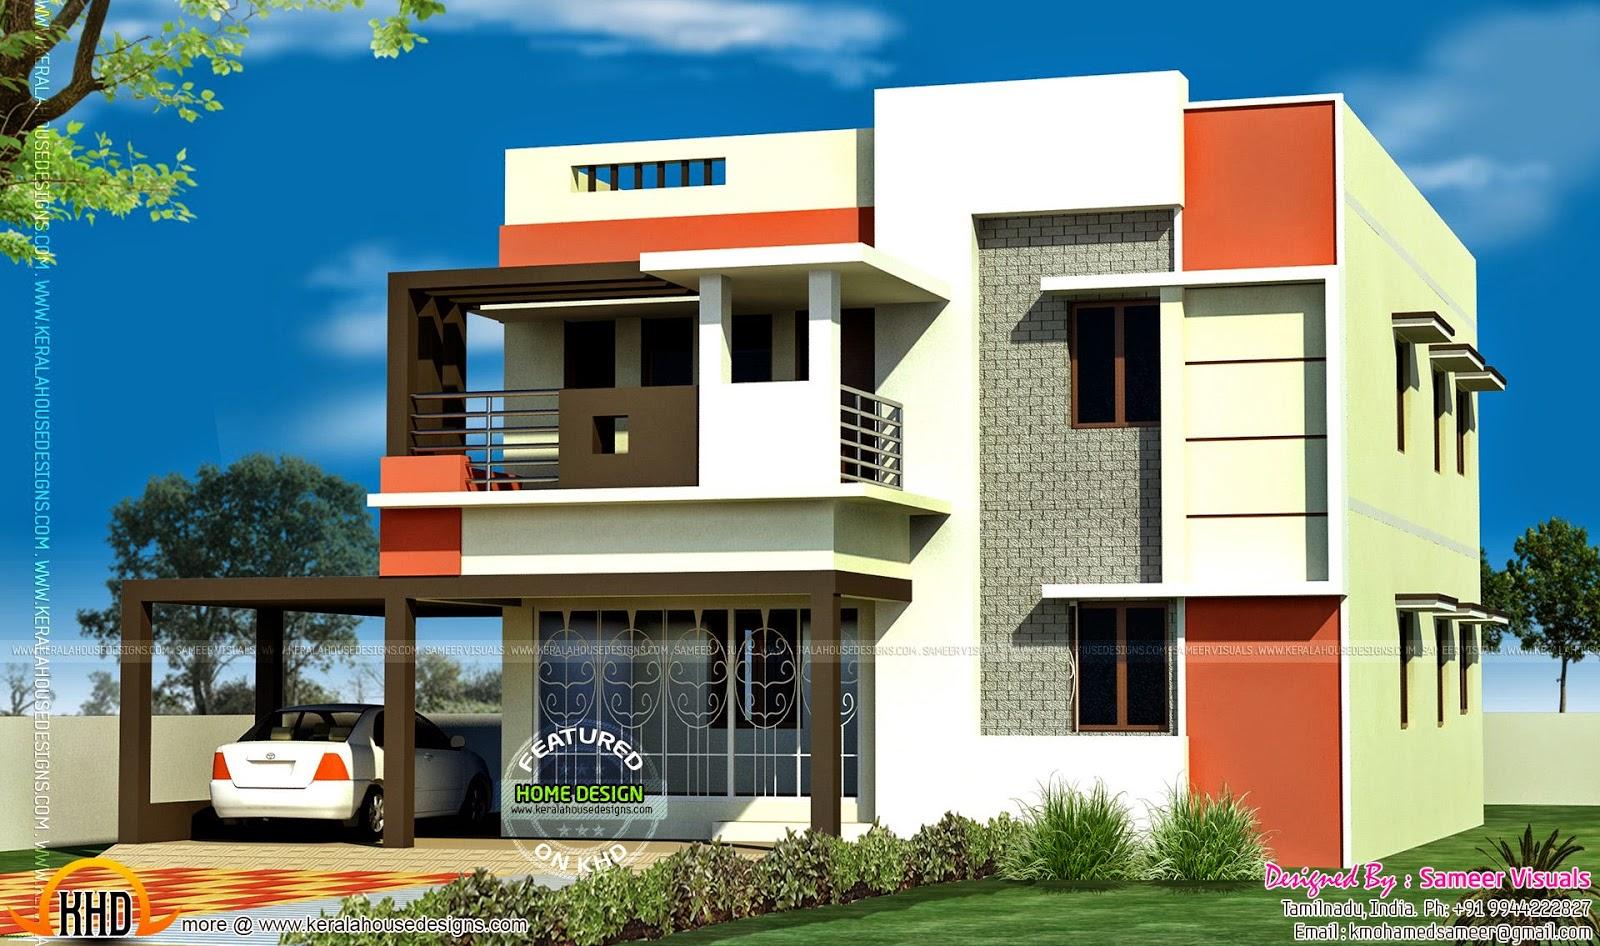 House building plans in tamilnadu amazing house plans for Bedroom designs tamilnadu